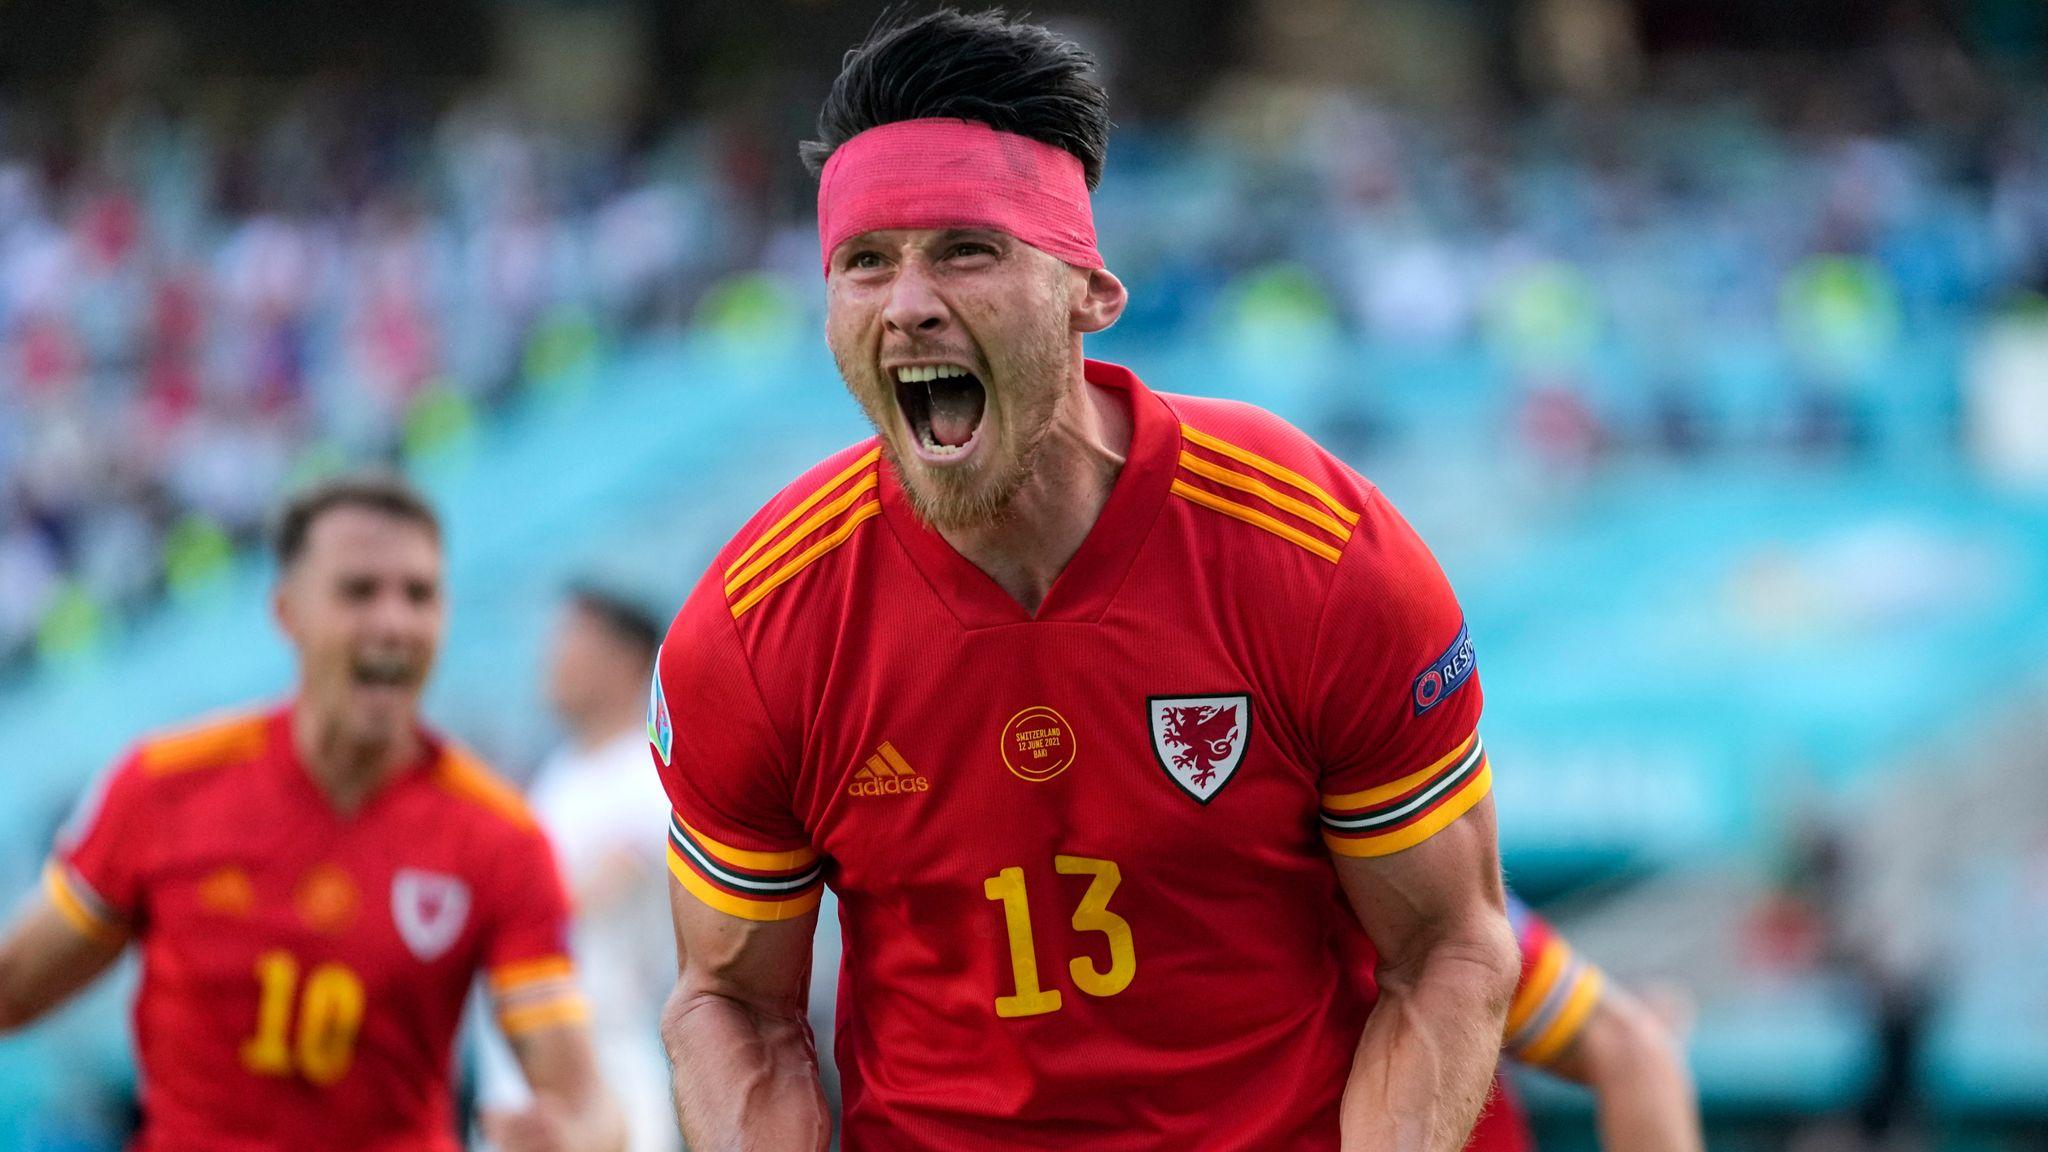 Wales 1-1 Switzerland: Kieffer Moore header secures point in Euro 2020 opener | Football News | Sky Sports